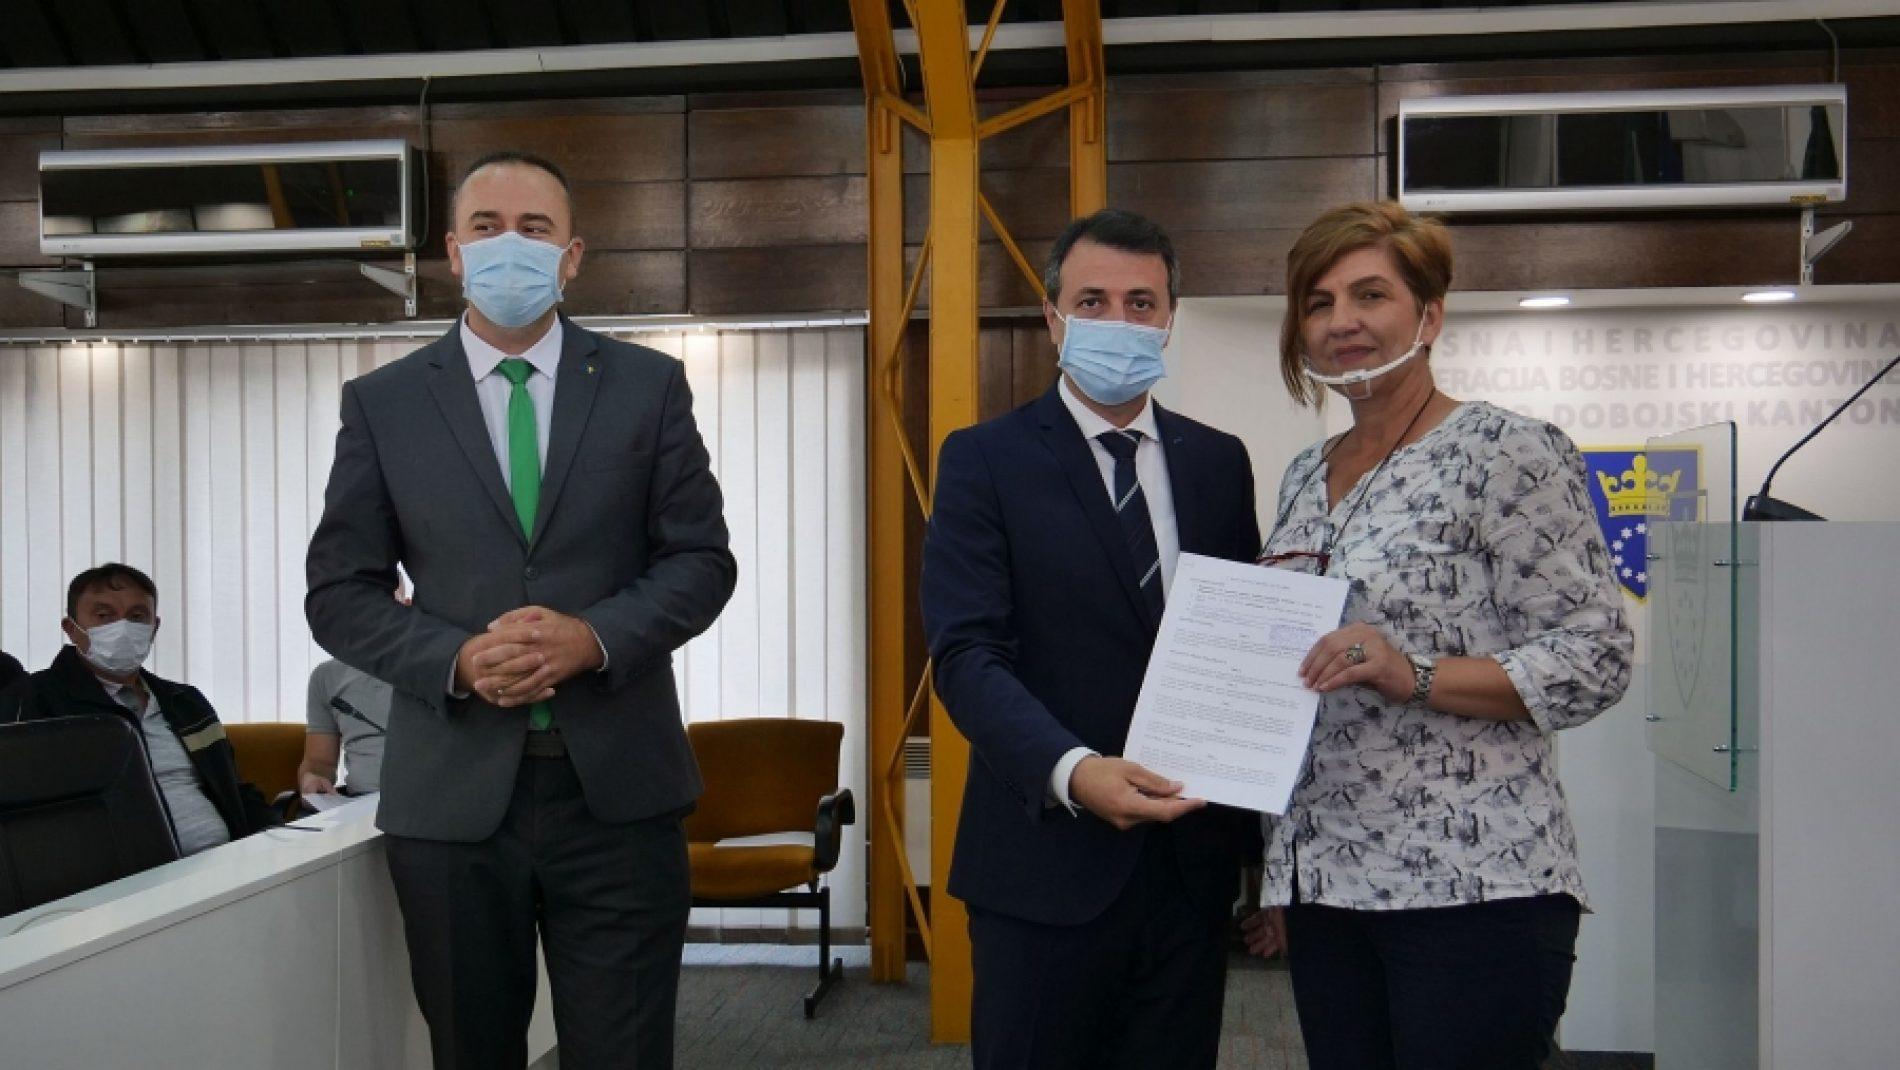 ZDK Potpisani ugovori o zapošljavanju 23 demobilisana borca